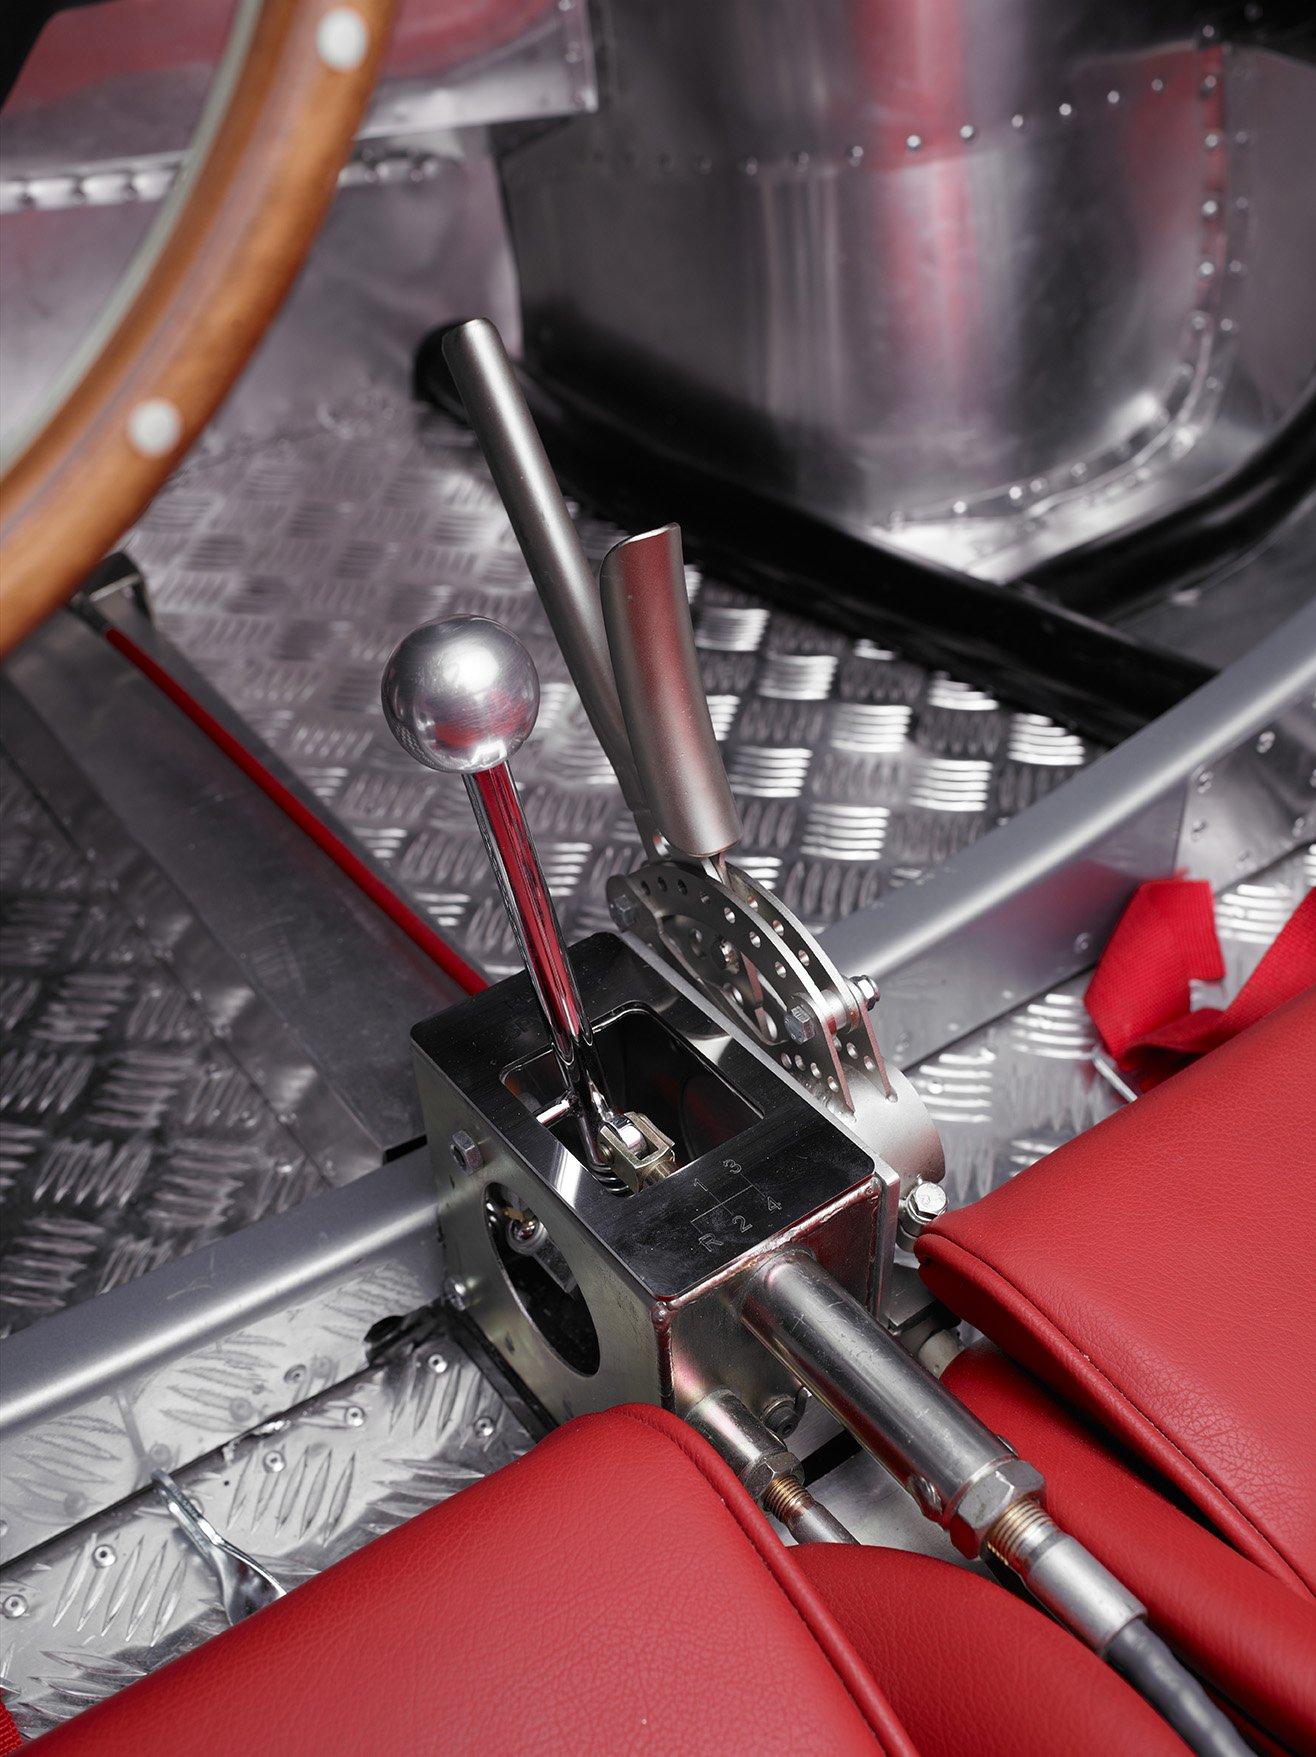 RCH 550 gear lever